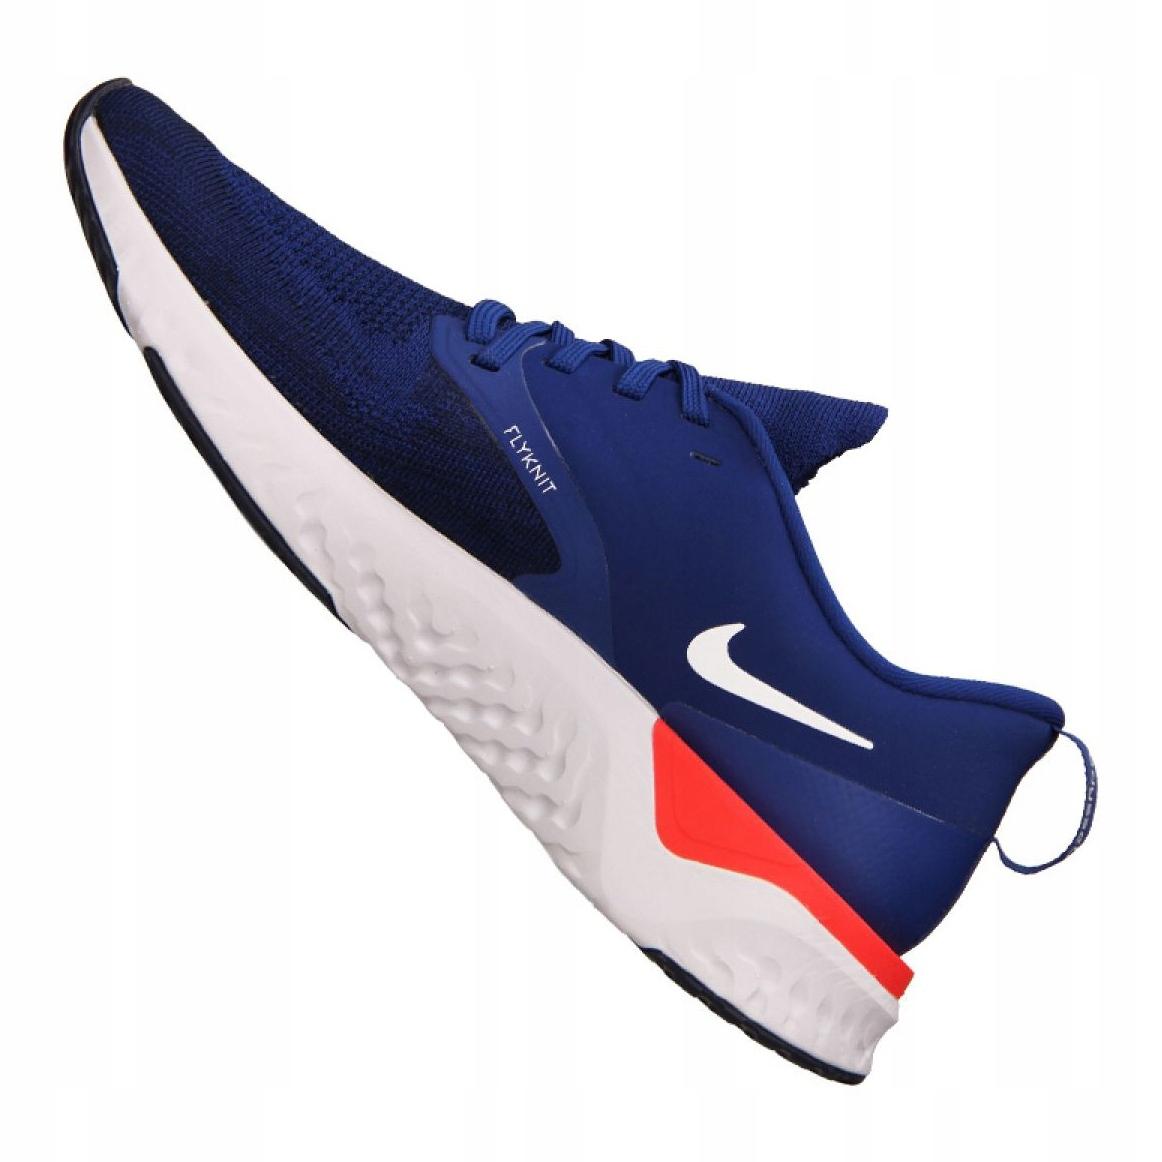 Tênis Nike Odyssey React 2 Shield M BQ1671 002 ButyModne.pl